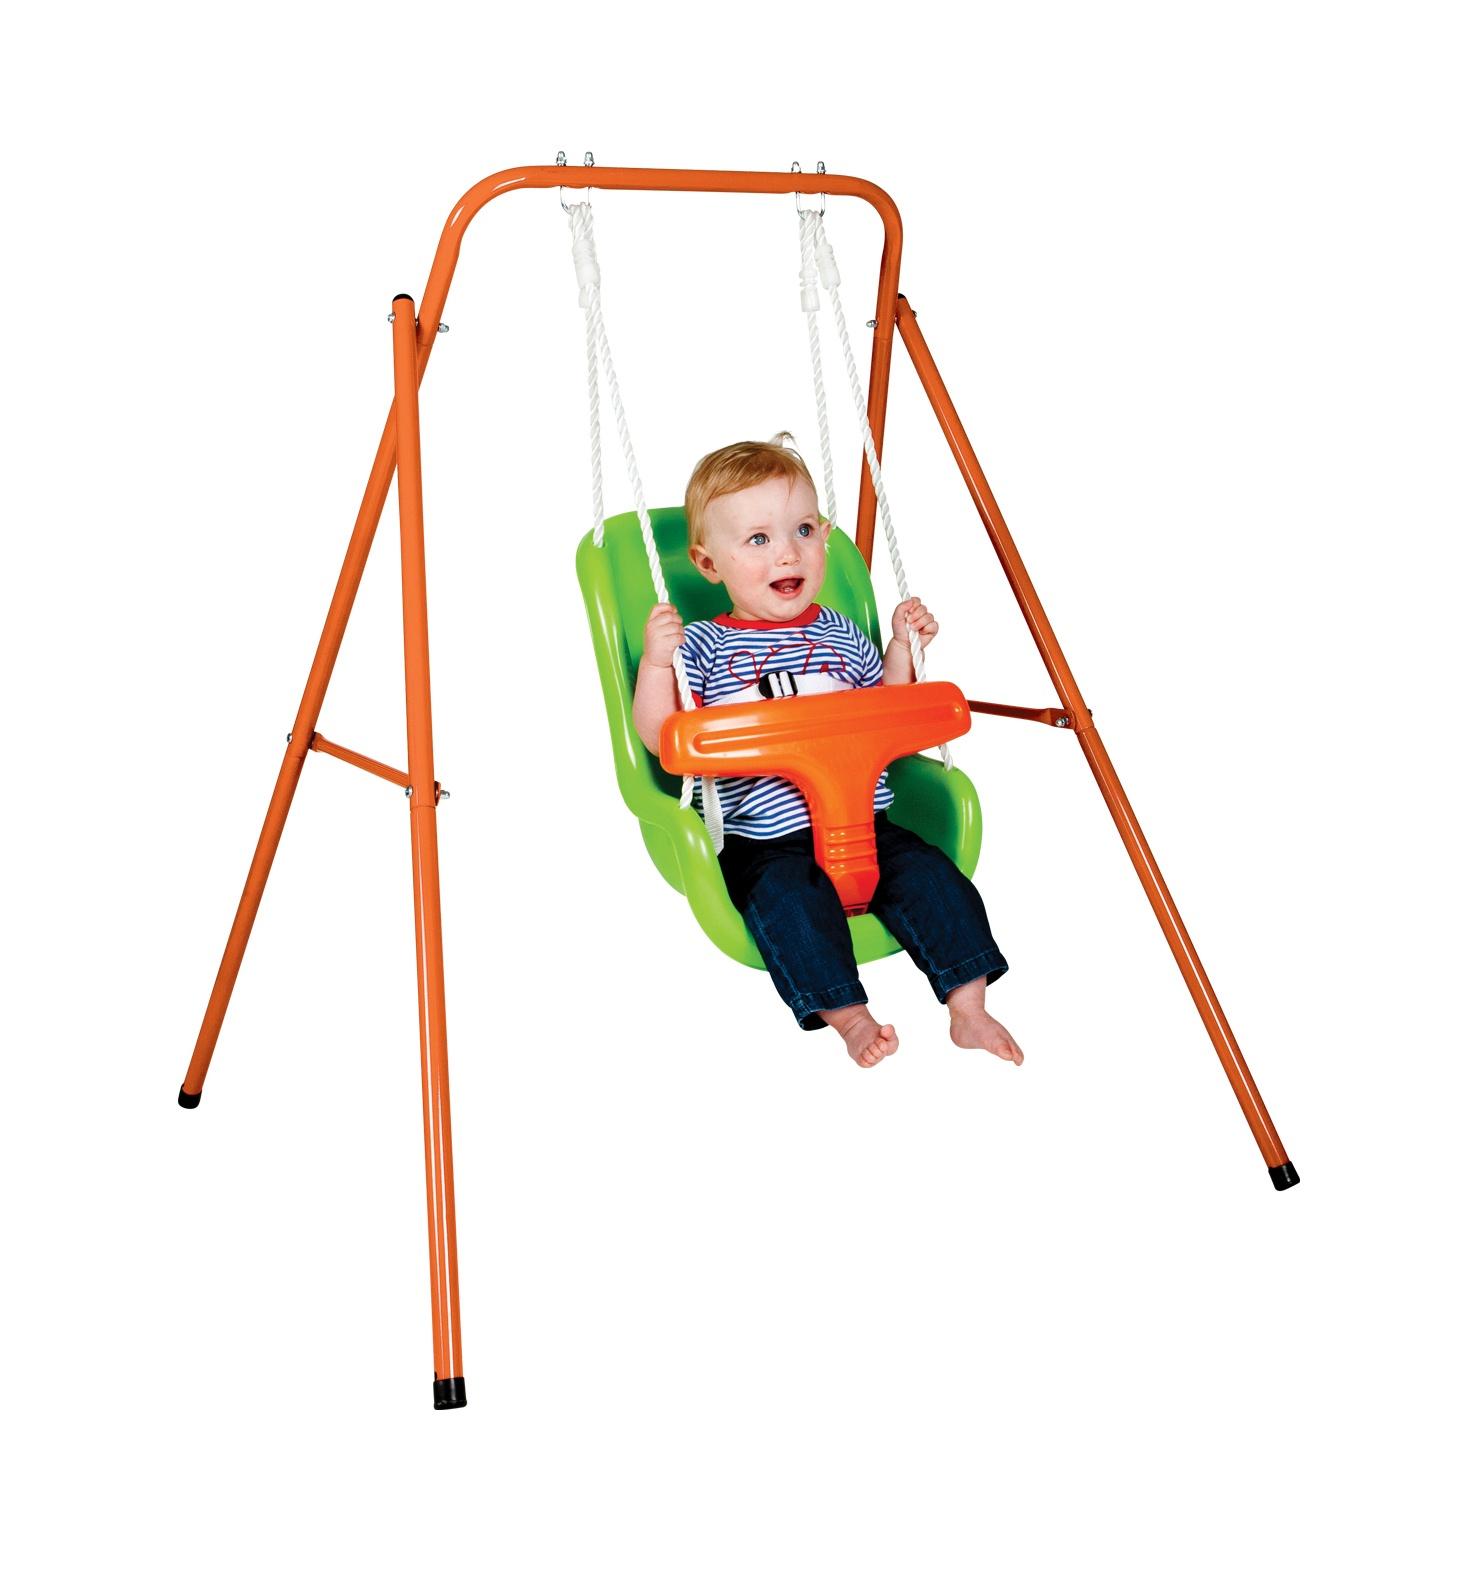 Swing Schommel Baby.Swing With Baby Seat Orange Green